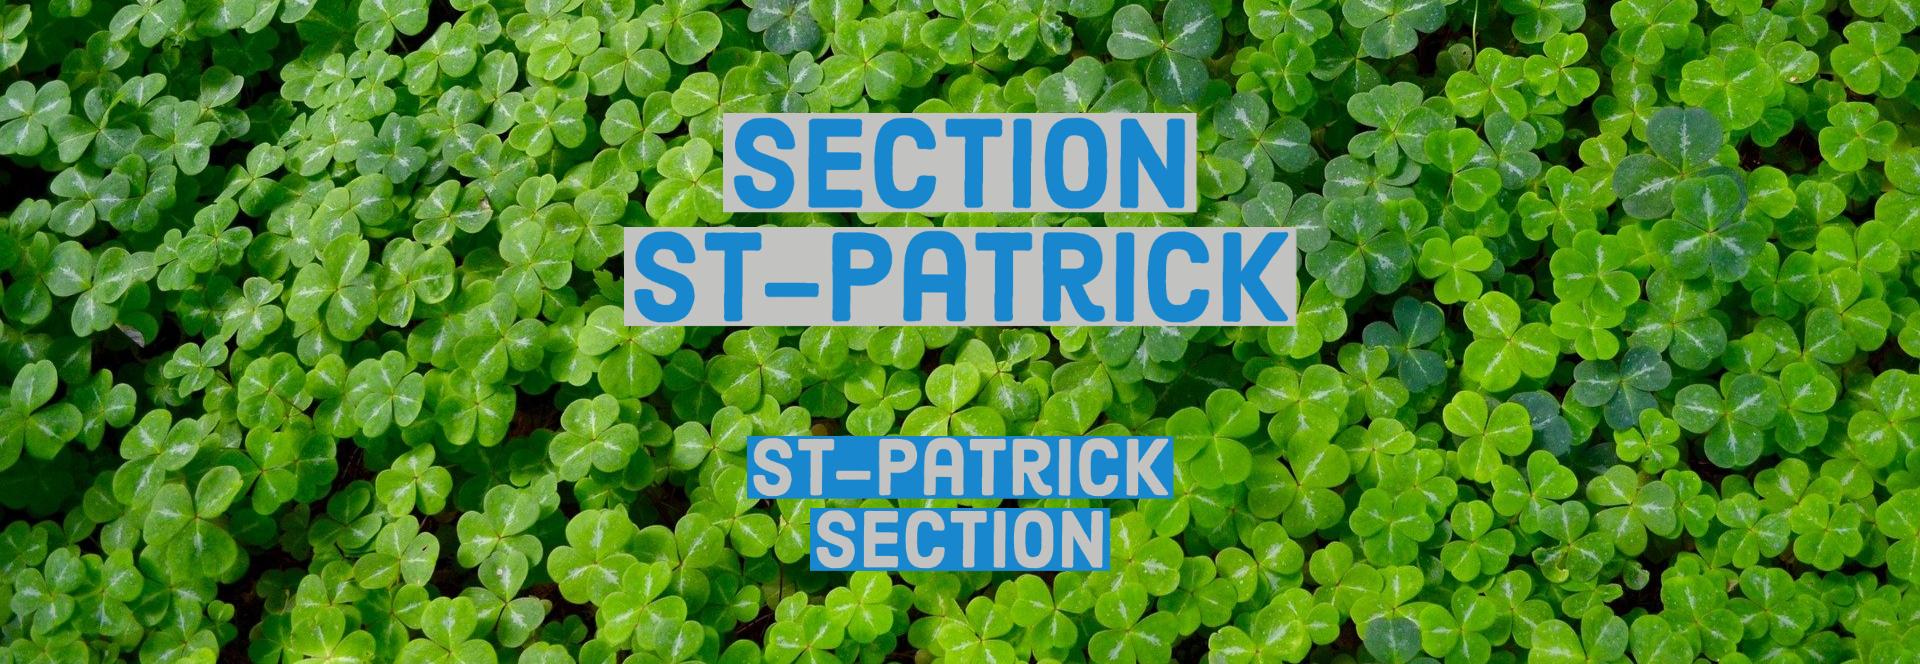 St-Patrick